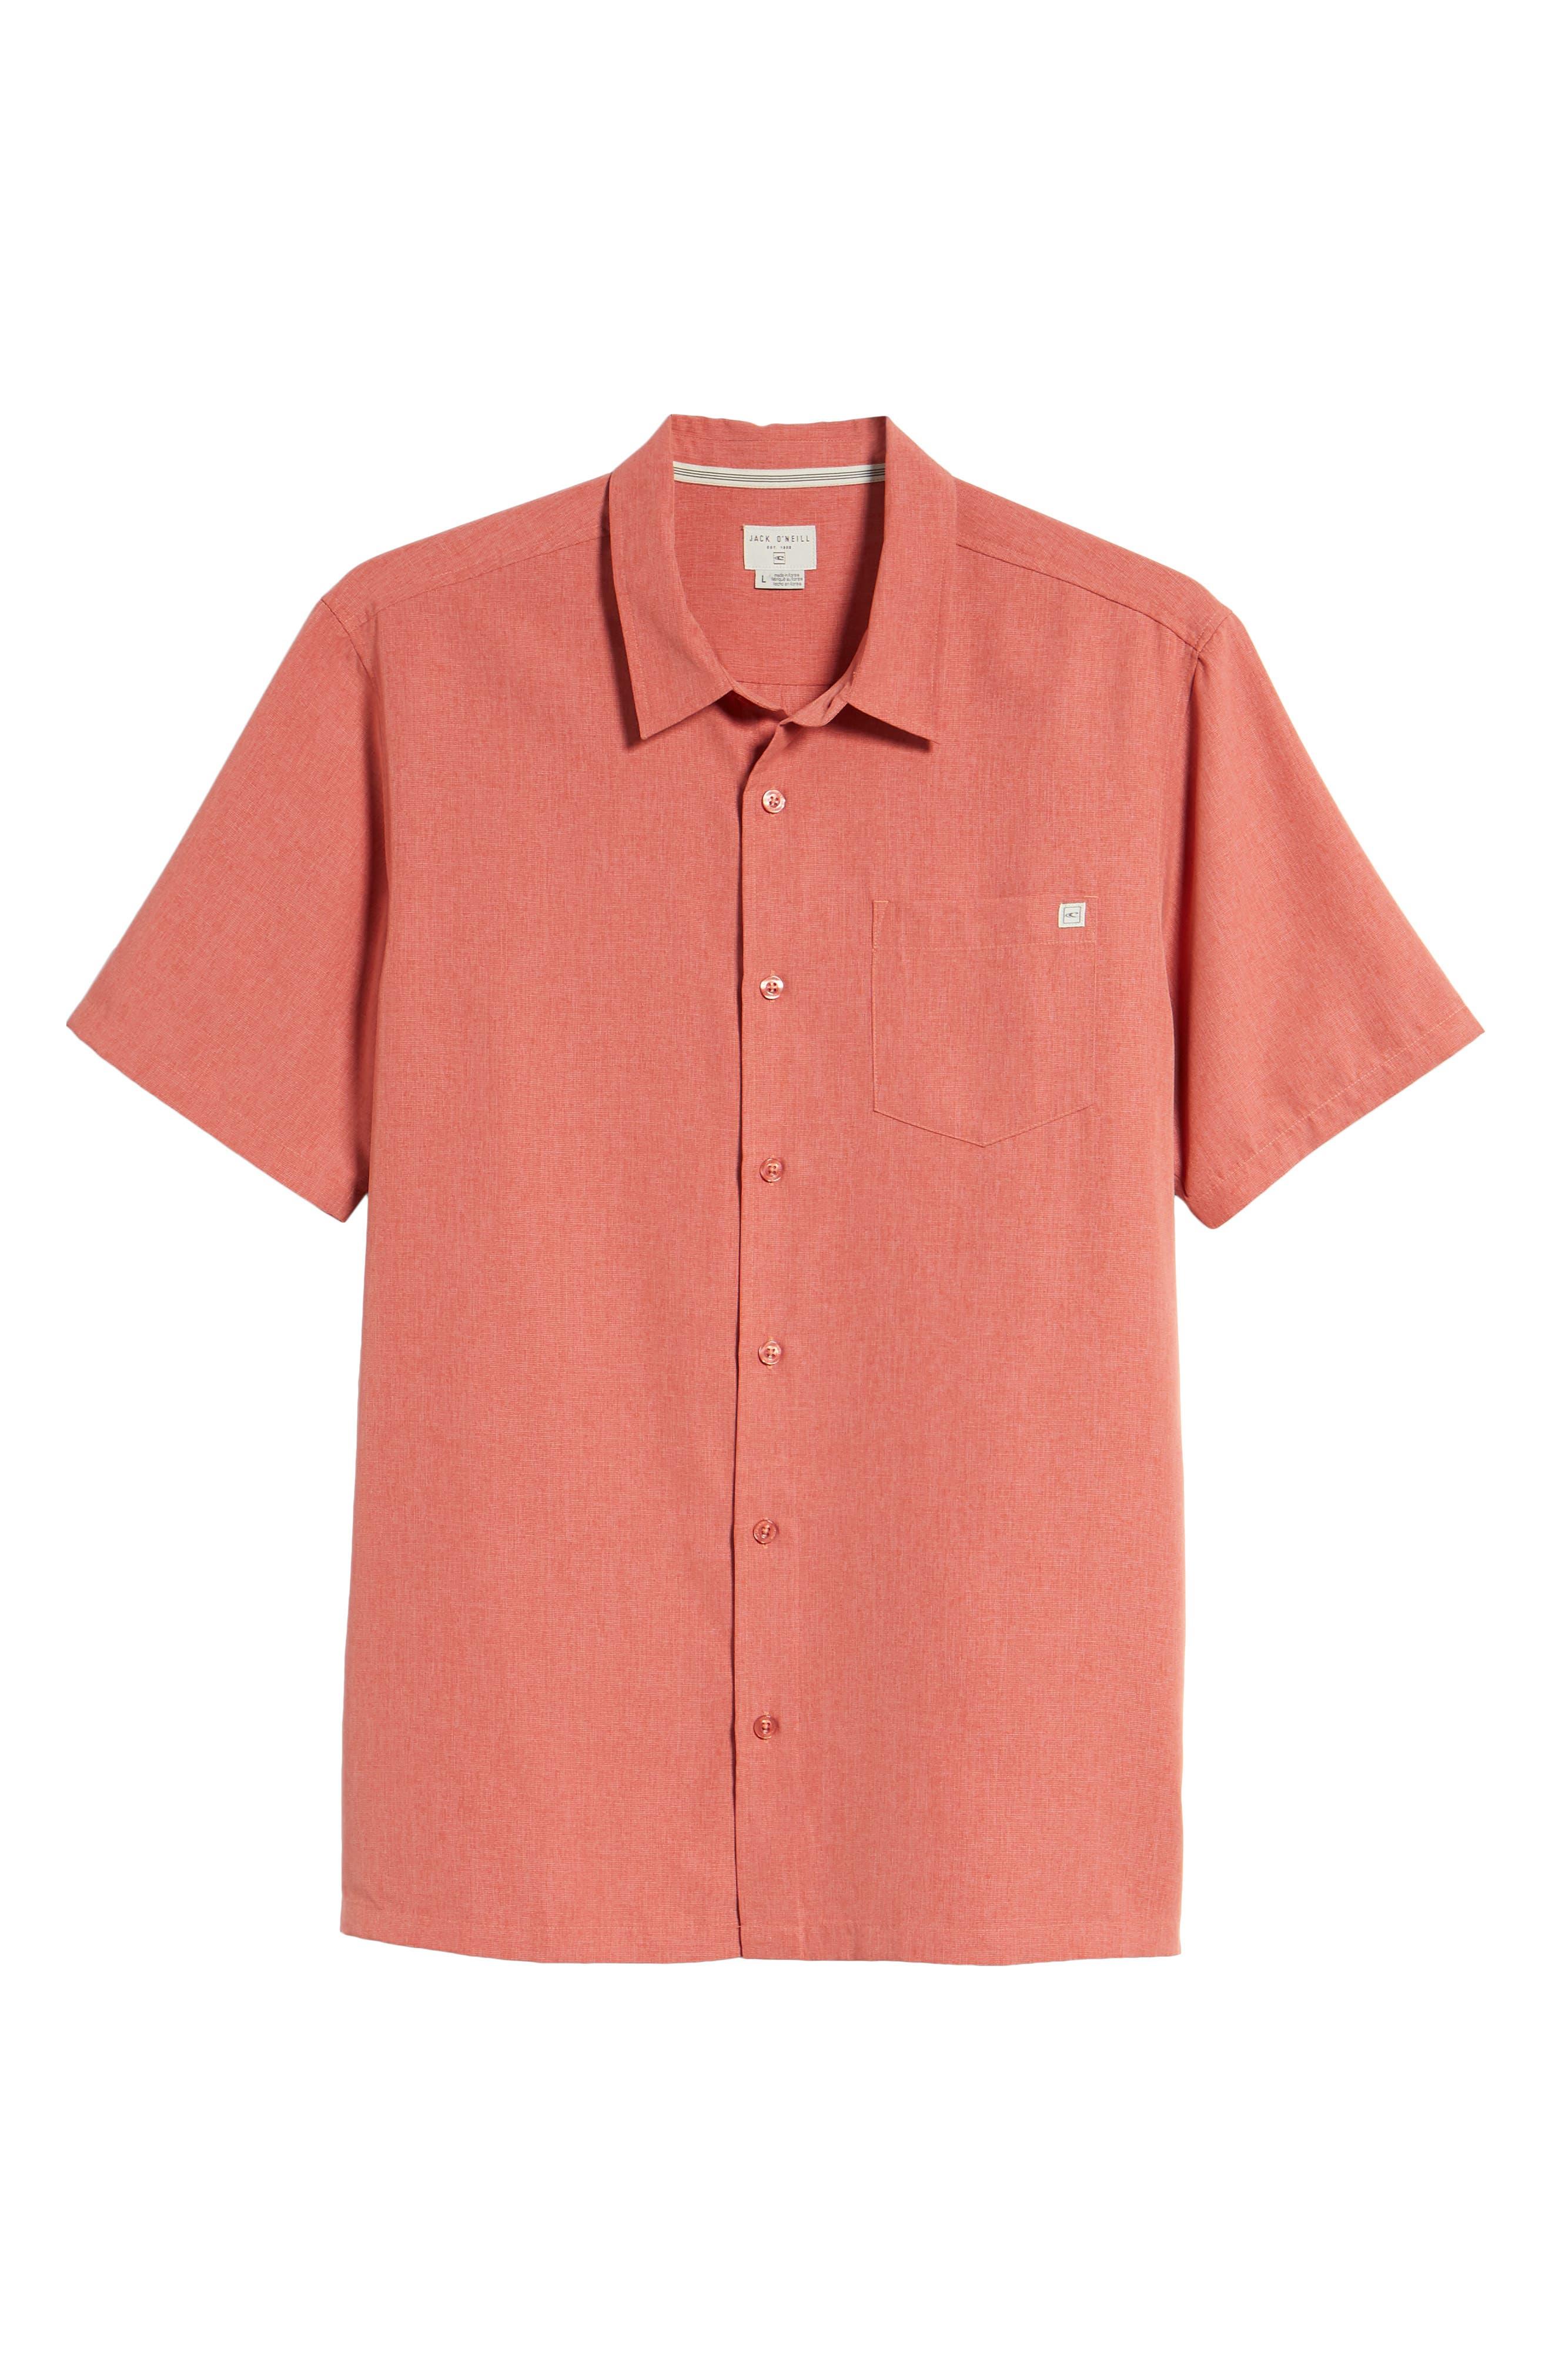 Liberty Sport Shirt,                             Alternate thumbnail 9, color,